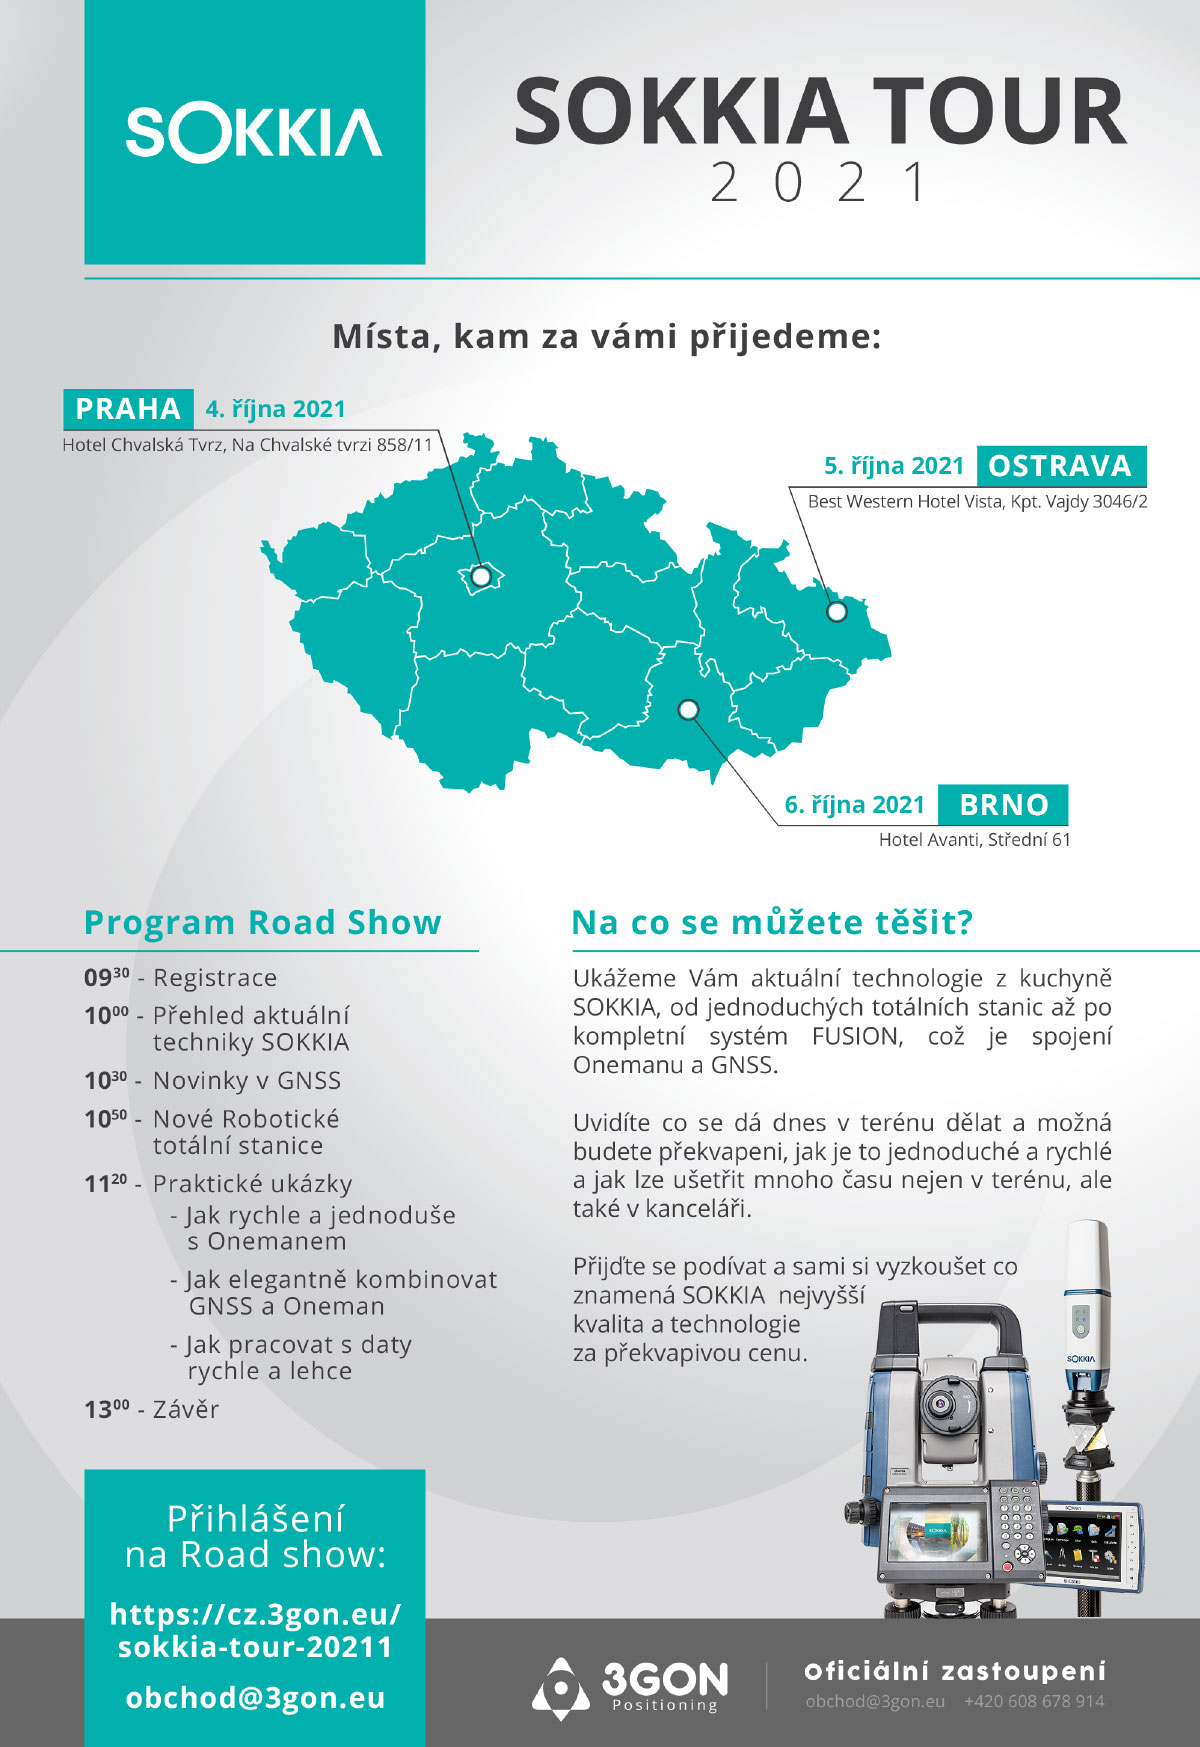 sokkia-tour-2021-road-show-praha-ostrava-brno